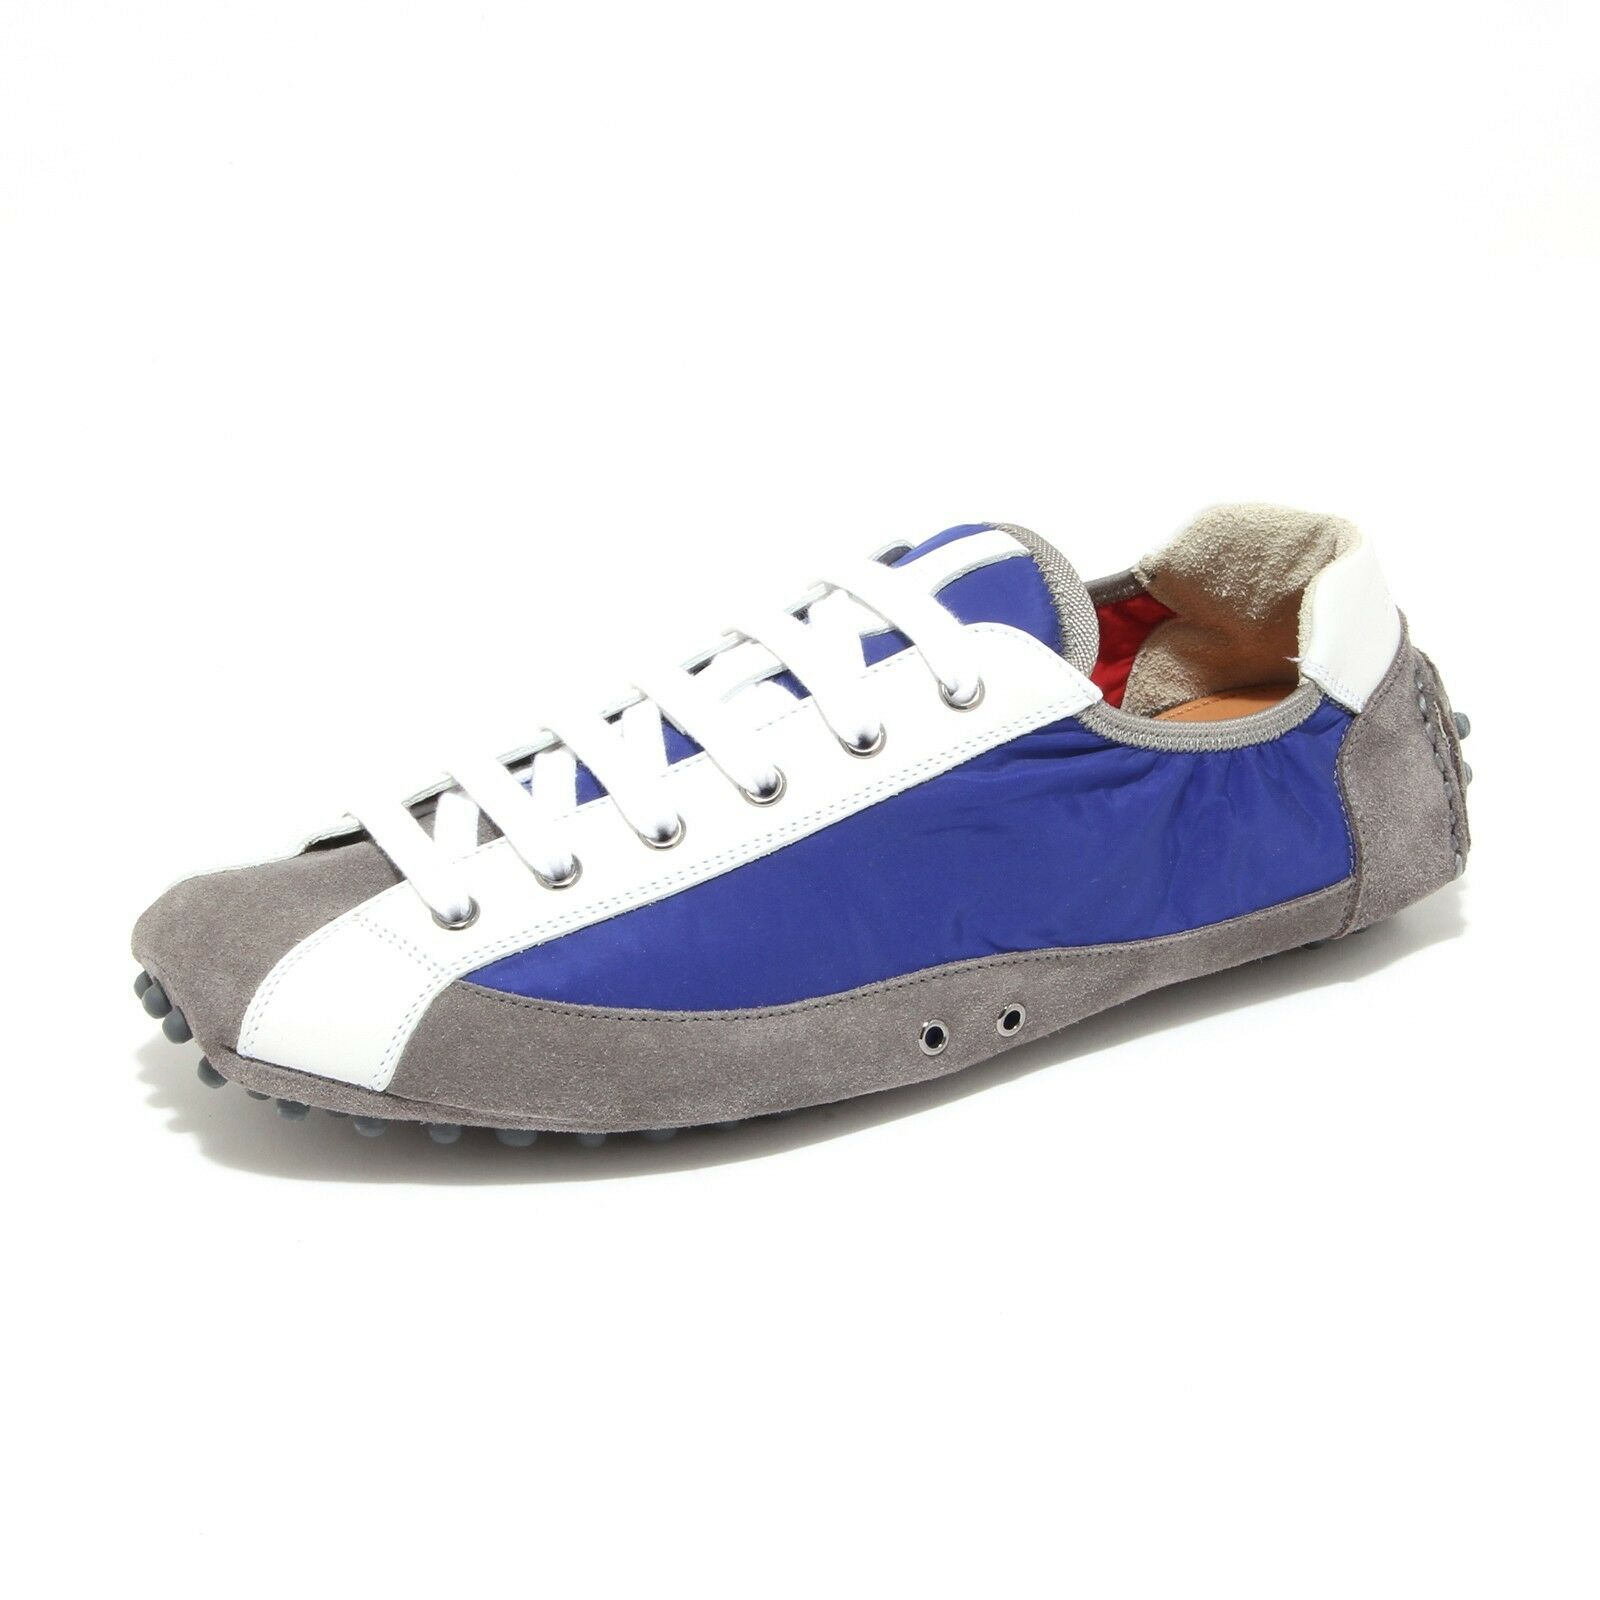 6385L sneakers uomo CAR SHOE men nylon scamosciato scarpe schuhe men SHOE 1021b2